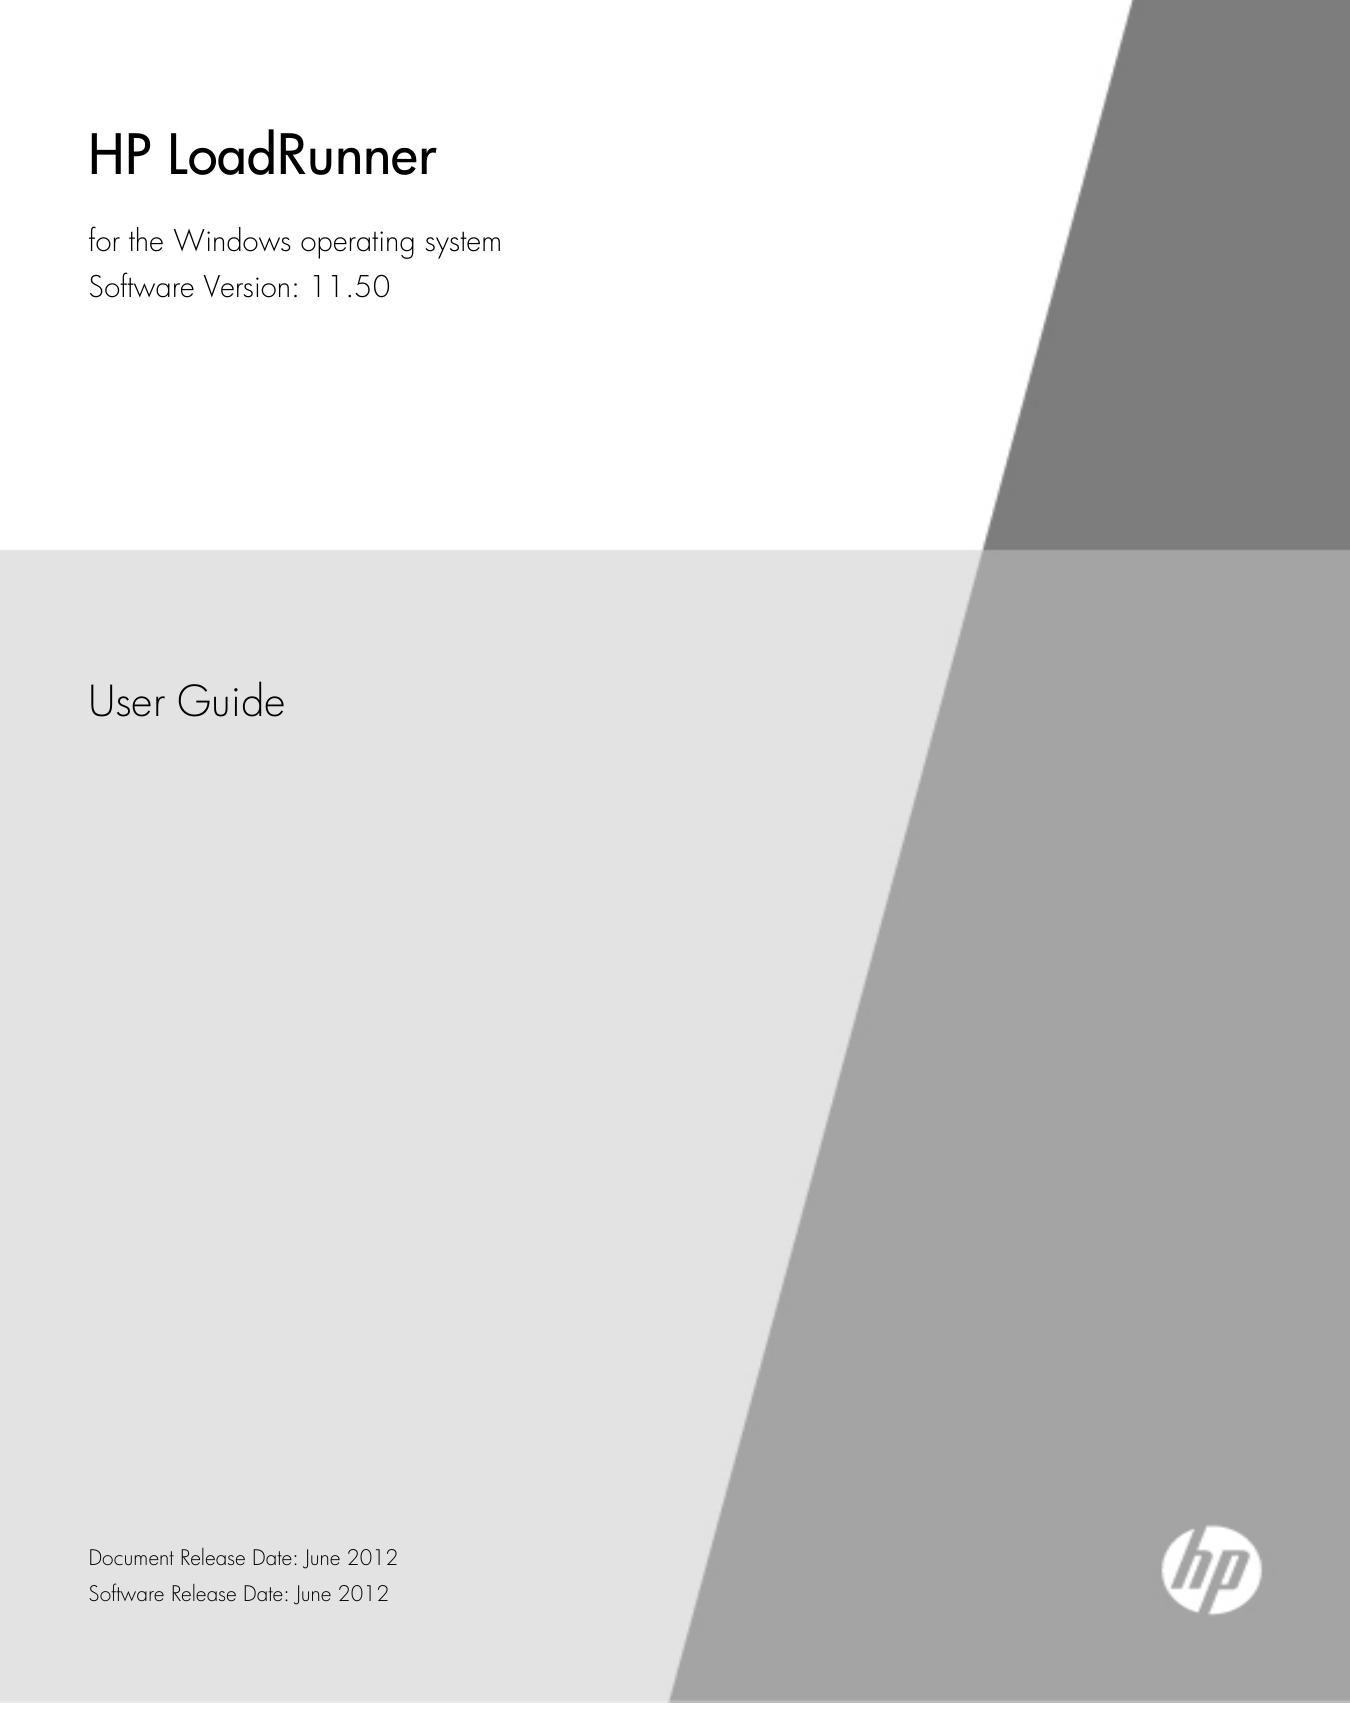 hp loadrunner user guide manualzz com rh manualzz com